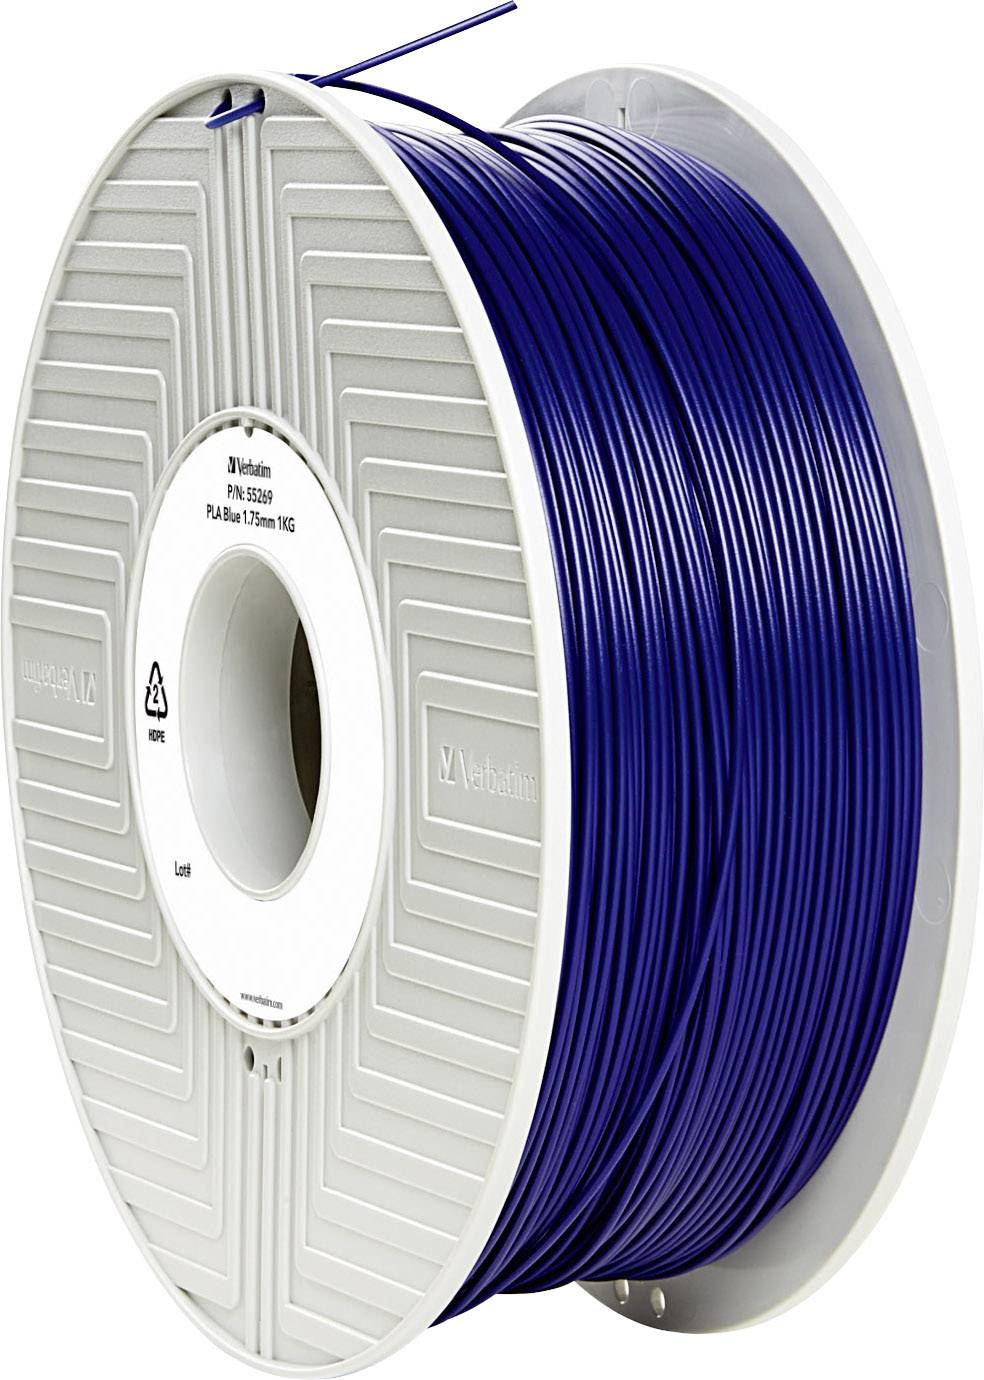 Vlákno pro 3D tiskárny Verbatim 55269, PLA plast, 1.75 mm, 1 kg, modrá